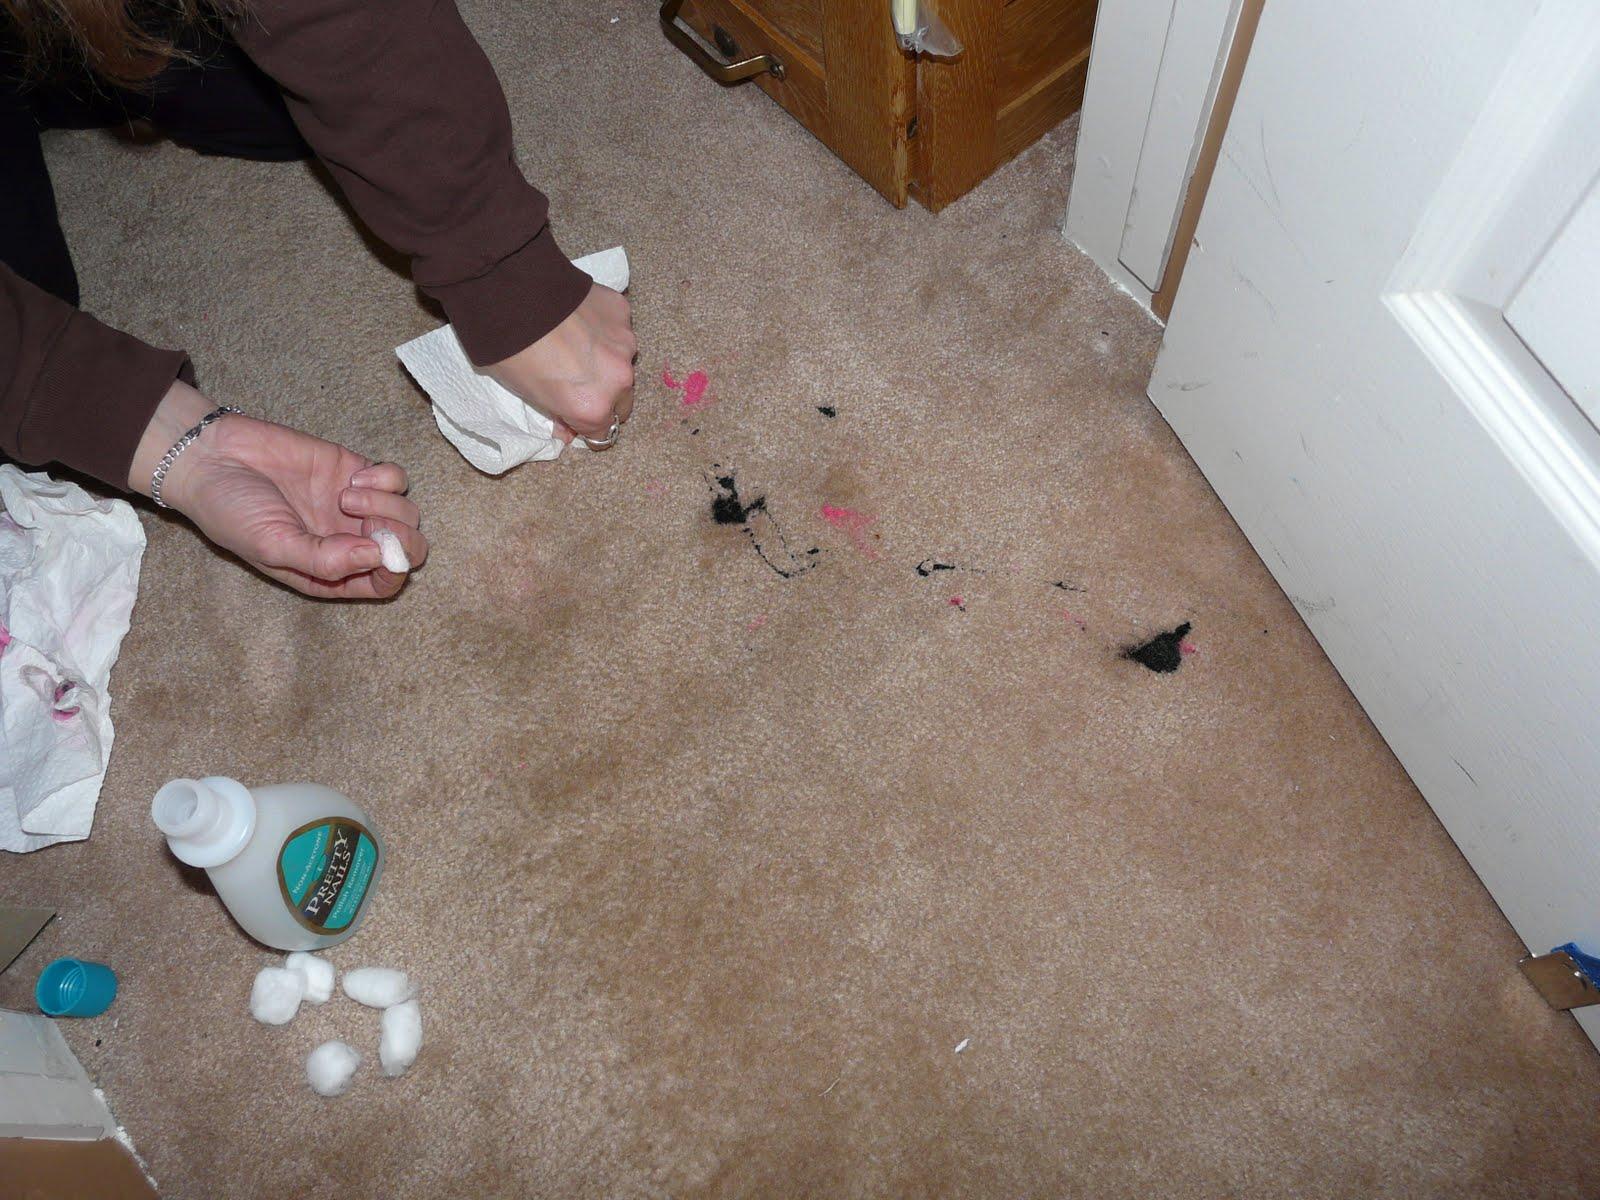 Removing dried nail polish from carpet - Cleaning Nail Polish Off Wool Carpet